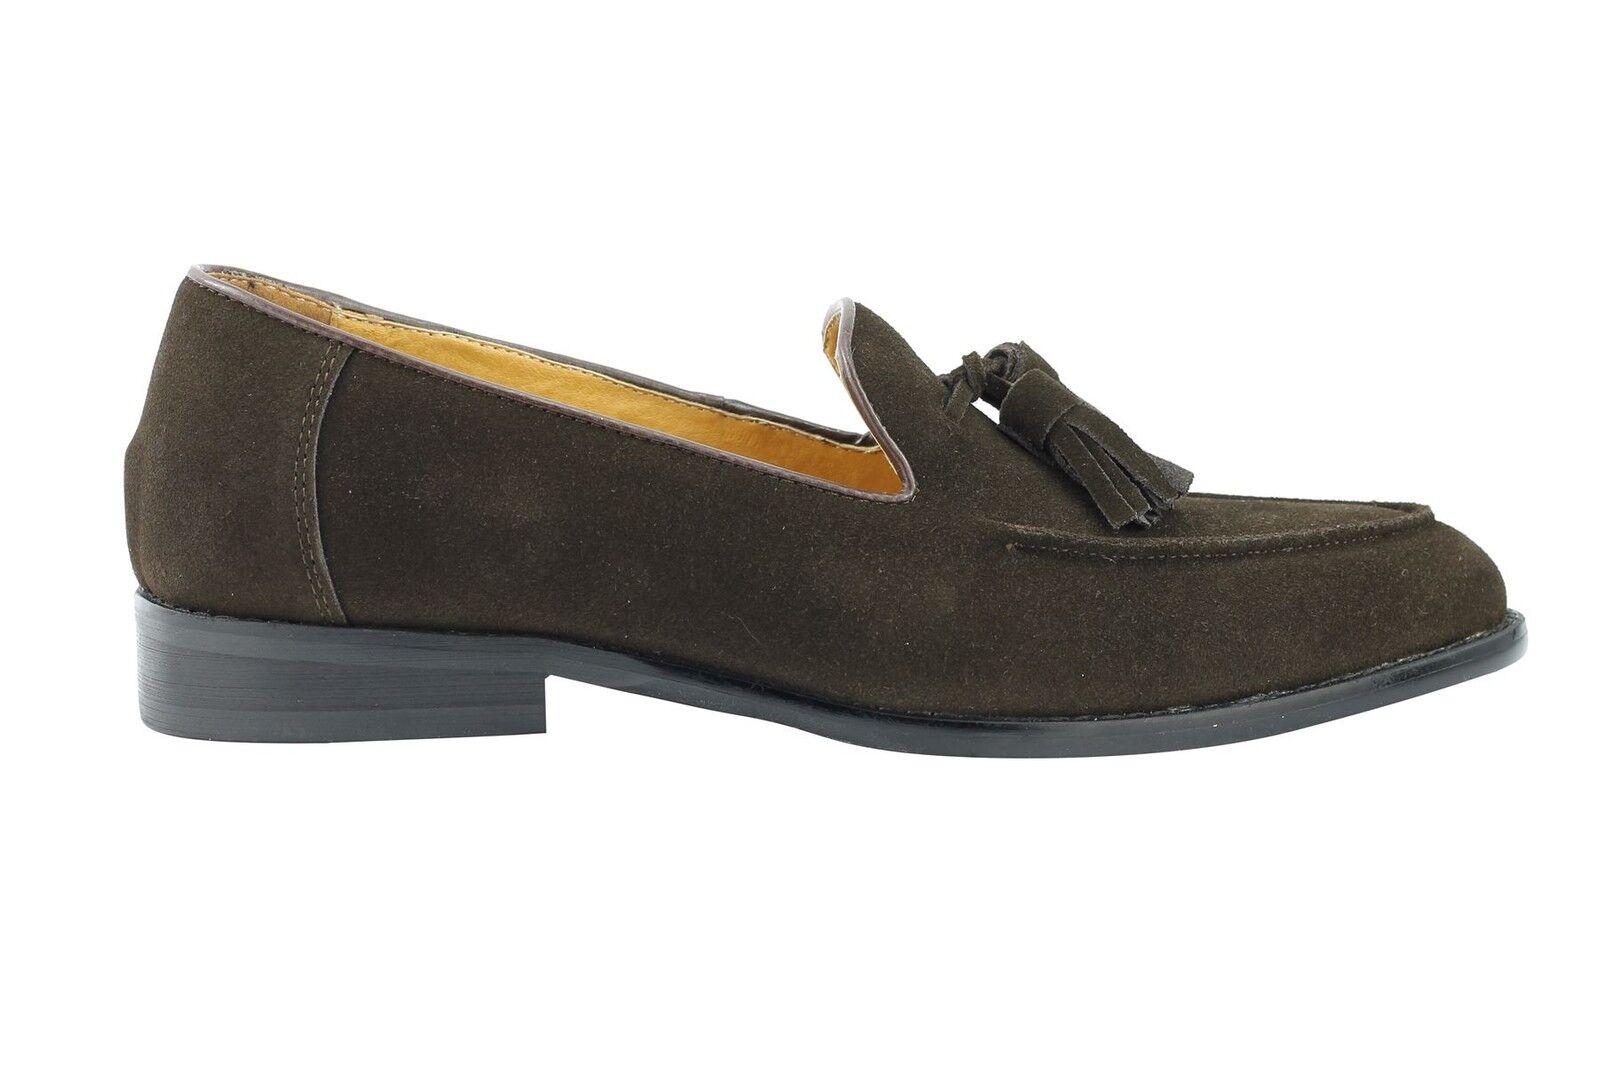 Herren Braun Real Suede Leder Tassel Slip Loafers On Classic Vintage Smart Schuhes